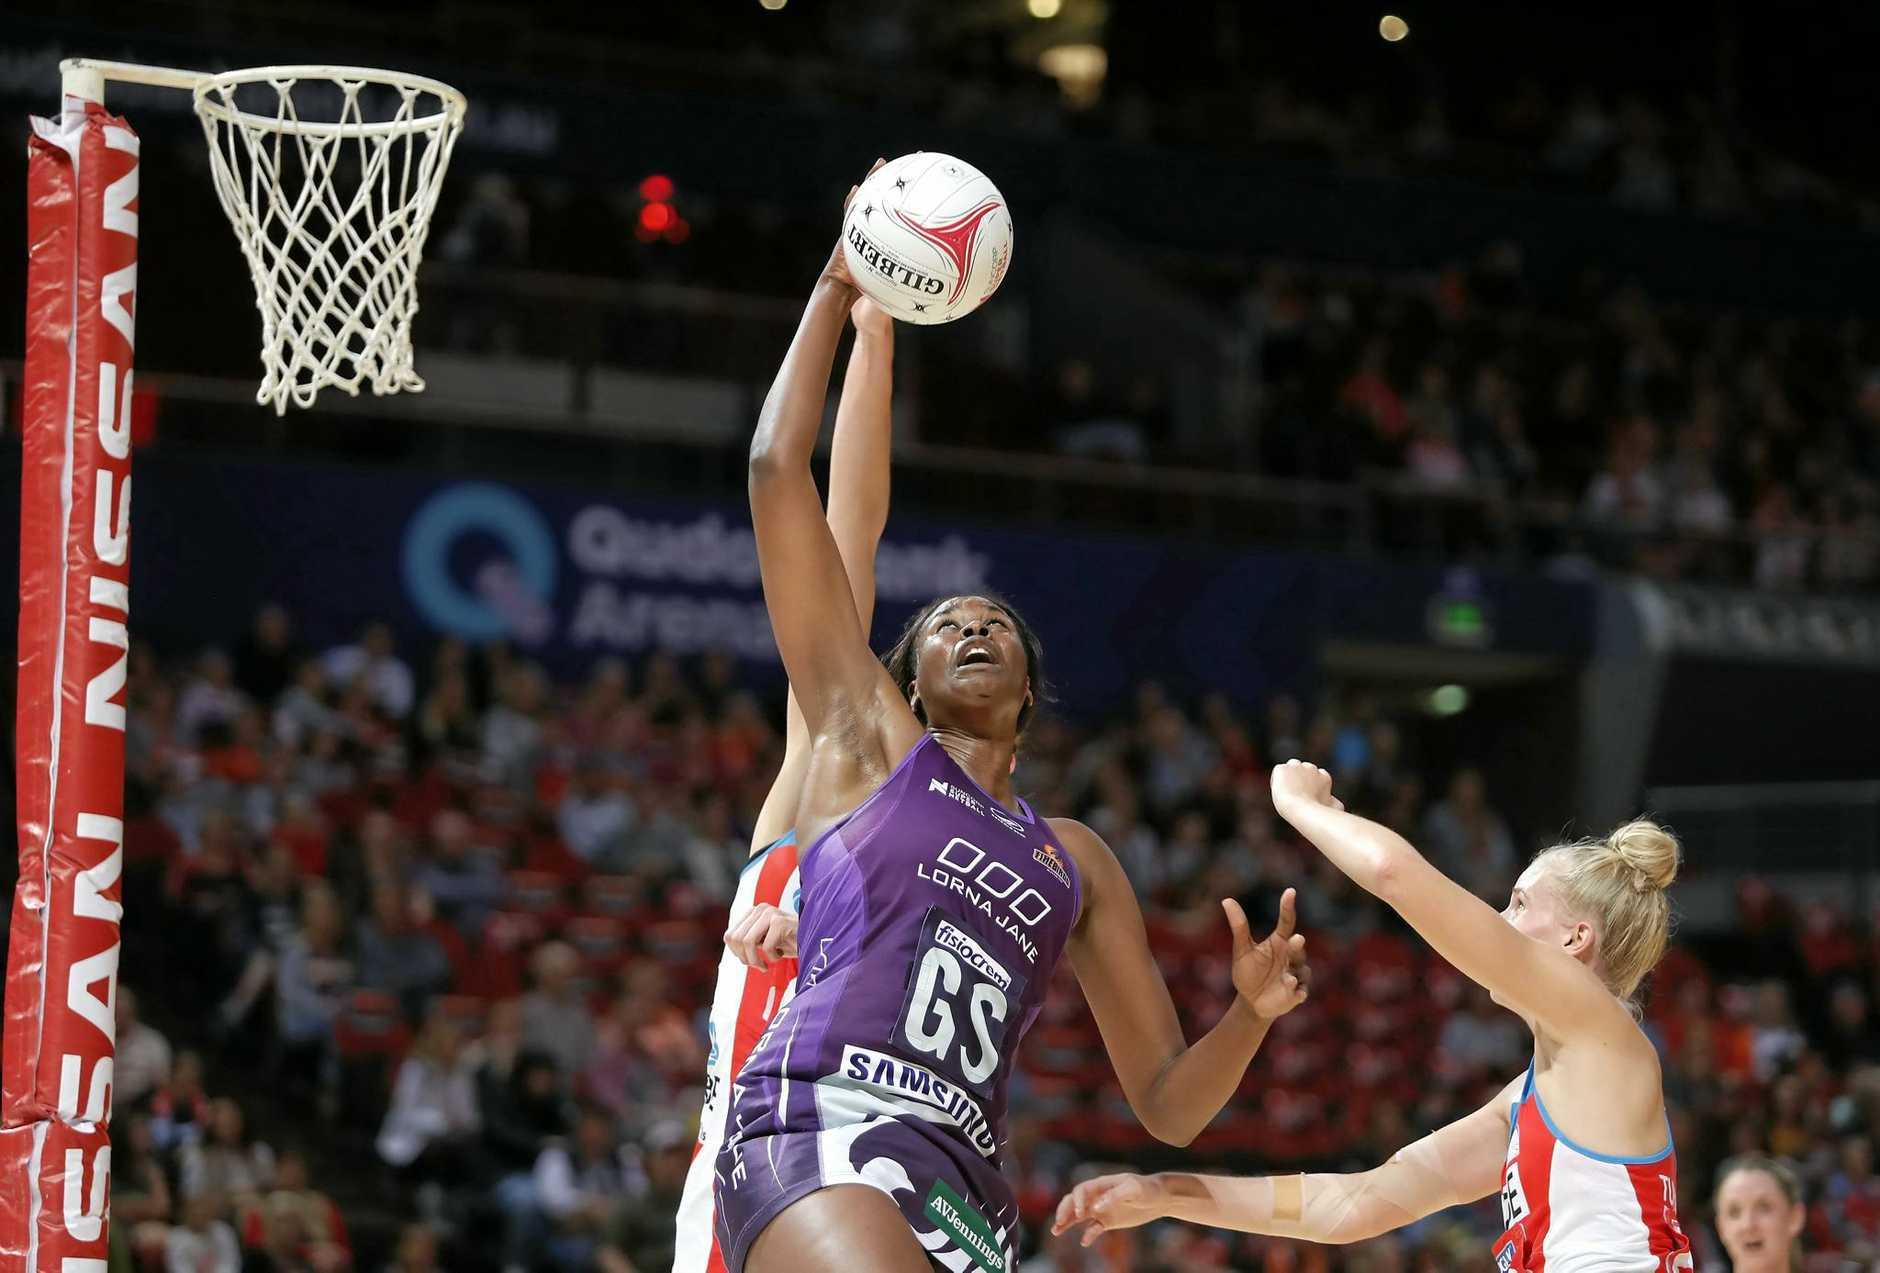 Shooting star Romelda Aiken has re-signed with the Queensland Firebirds.